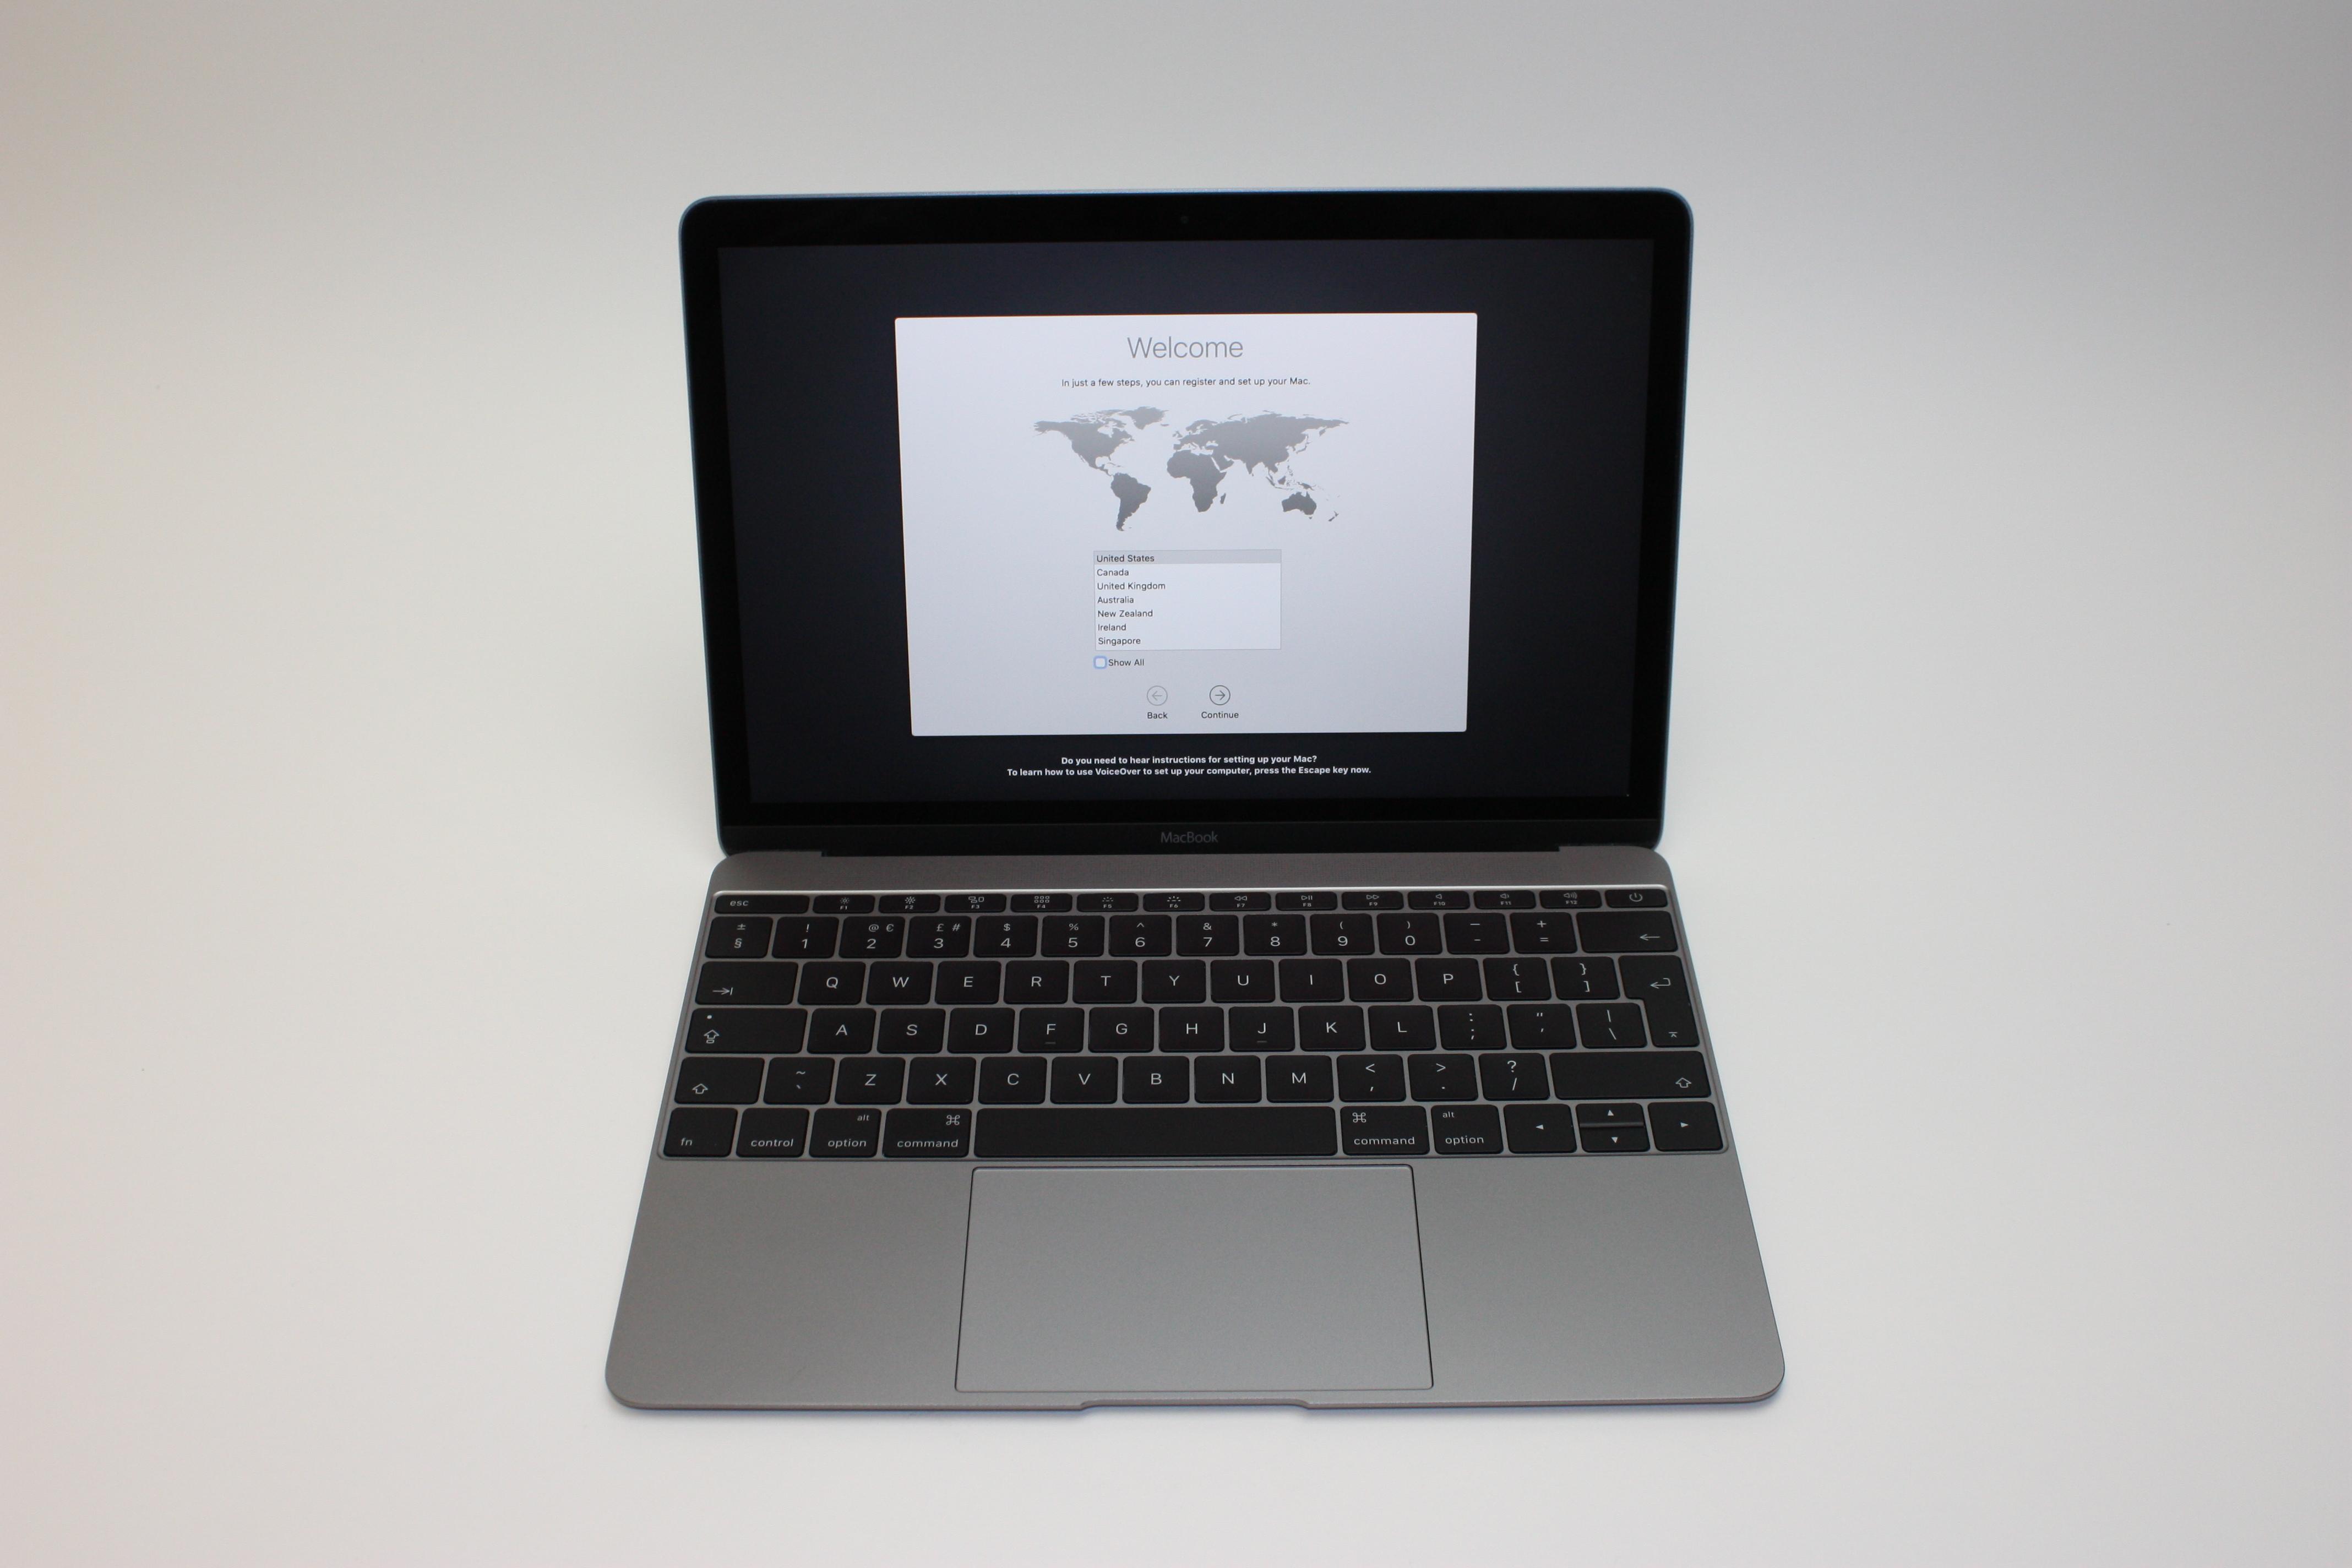 MacBook 12-inch Retina, 1.3 GHz Intel Core M, 8 GB 1600 MHz DDR3, 500 GB Flash Storage, Product age: 29 months, image 1